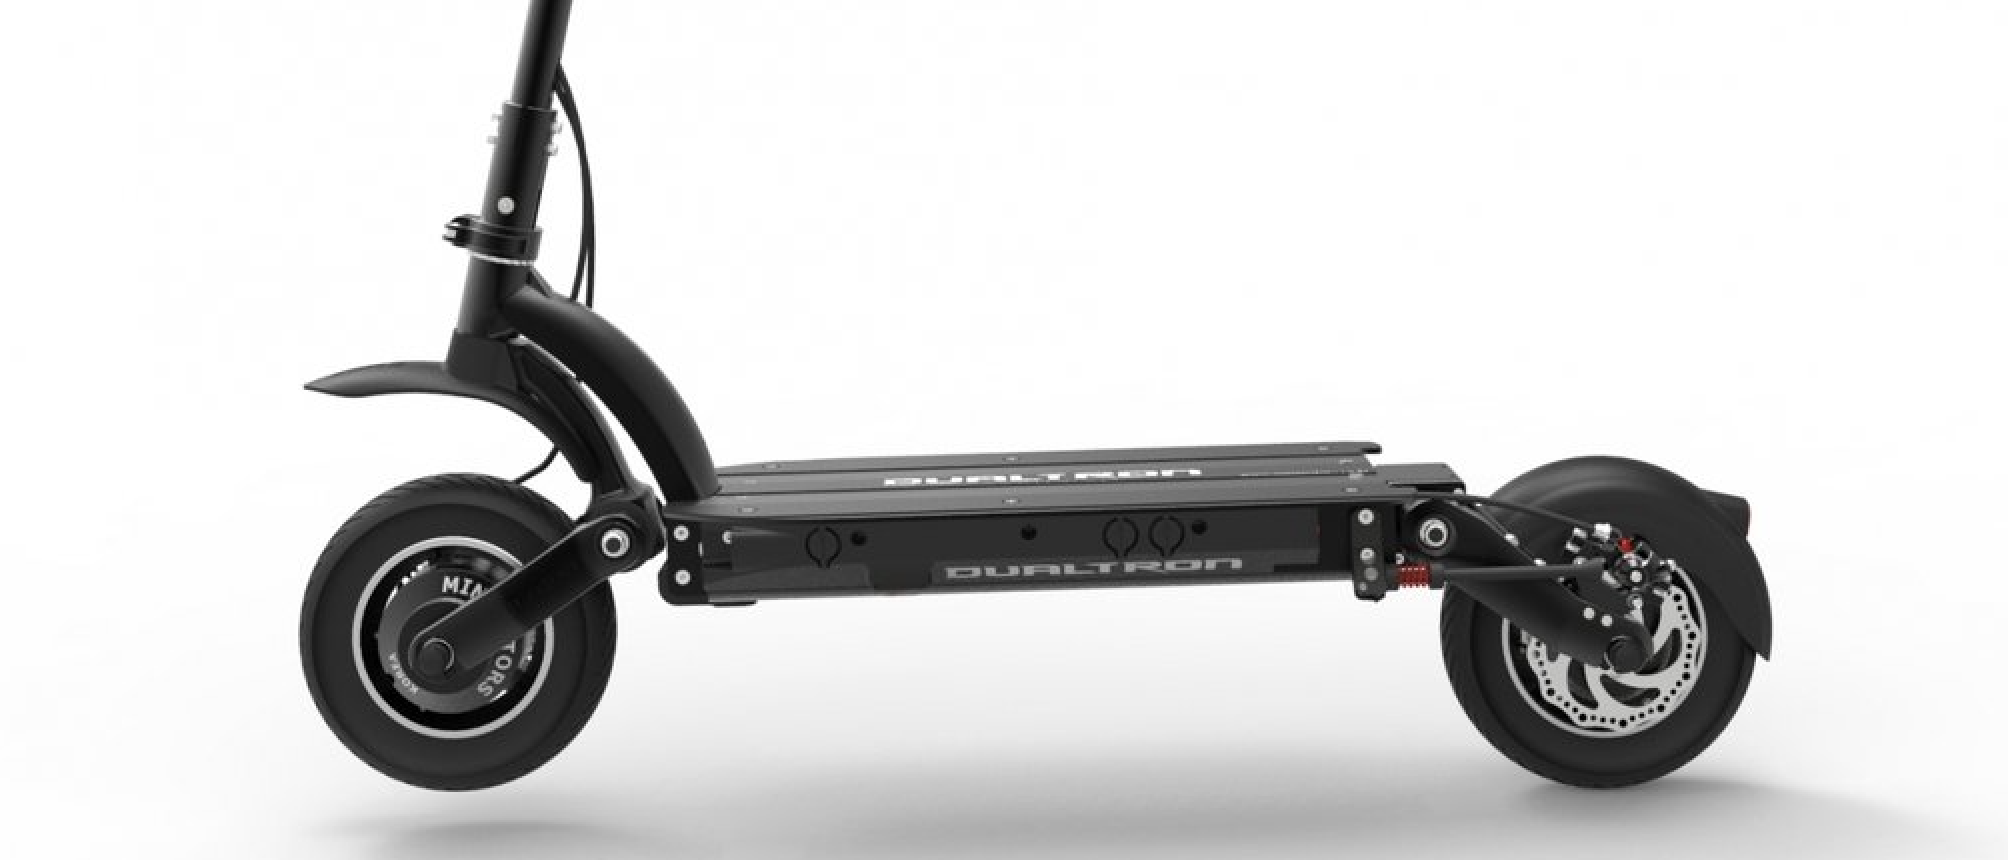 Dualtron MX e-Scooter